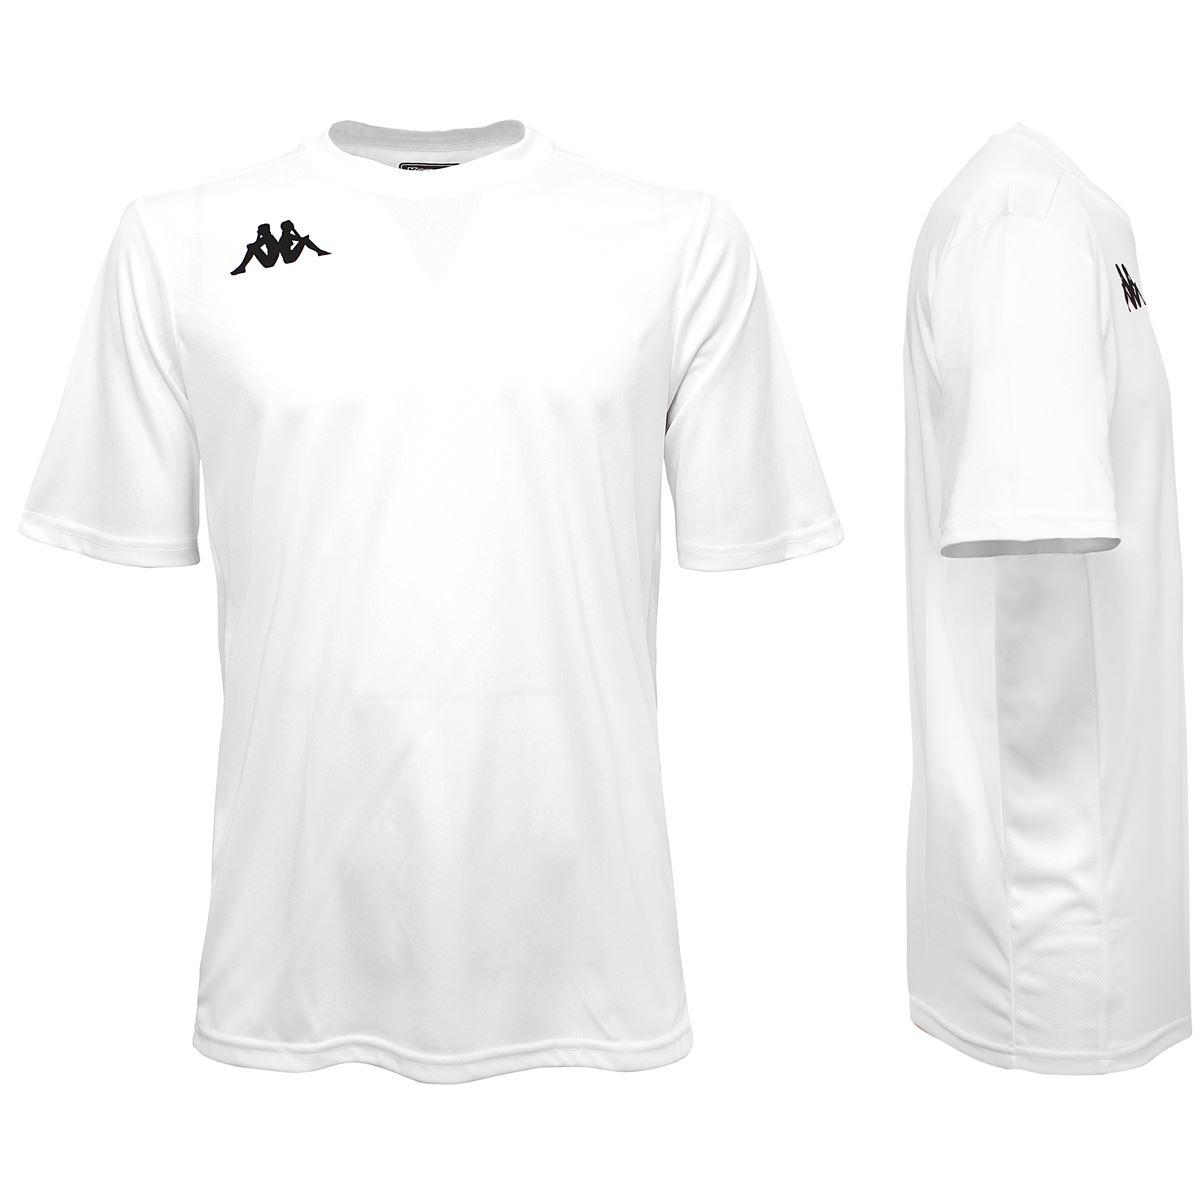 Kappa T-shirt sport Active Jersey KAPPA4SOCCER WENET Boy Shirt